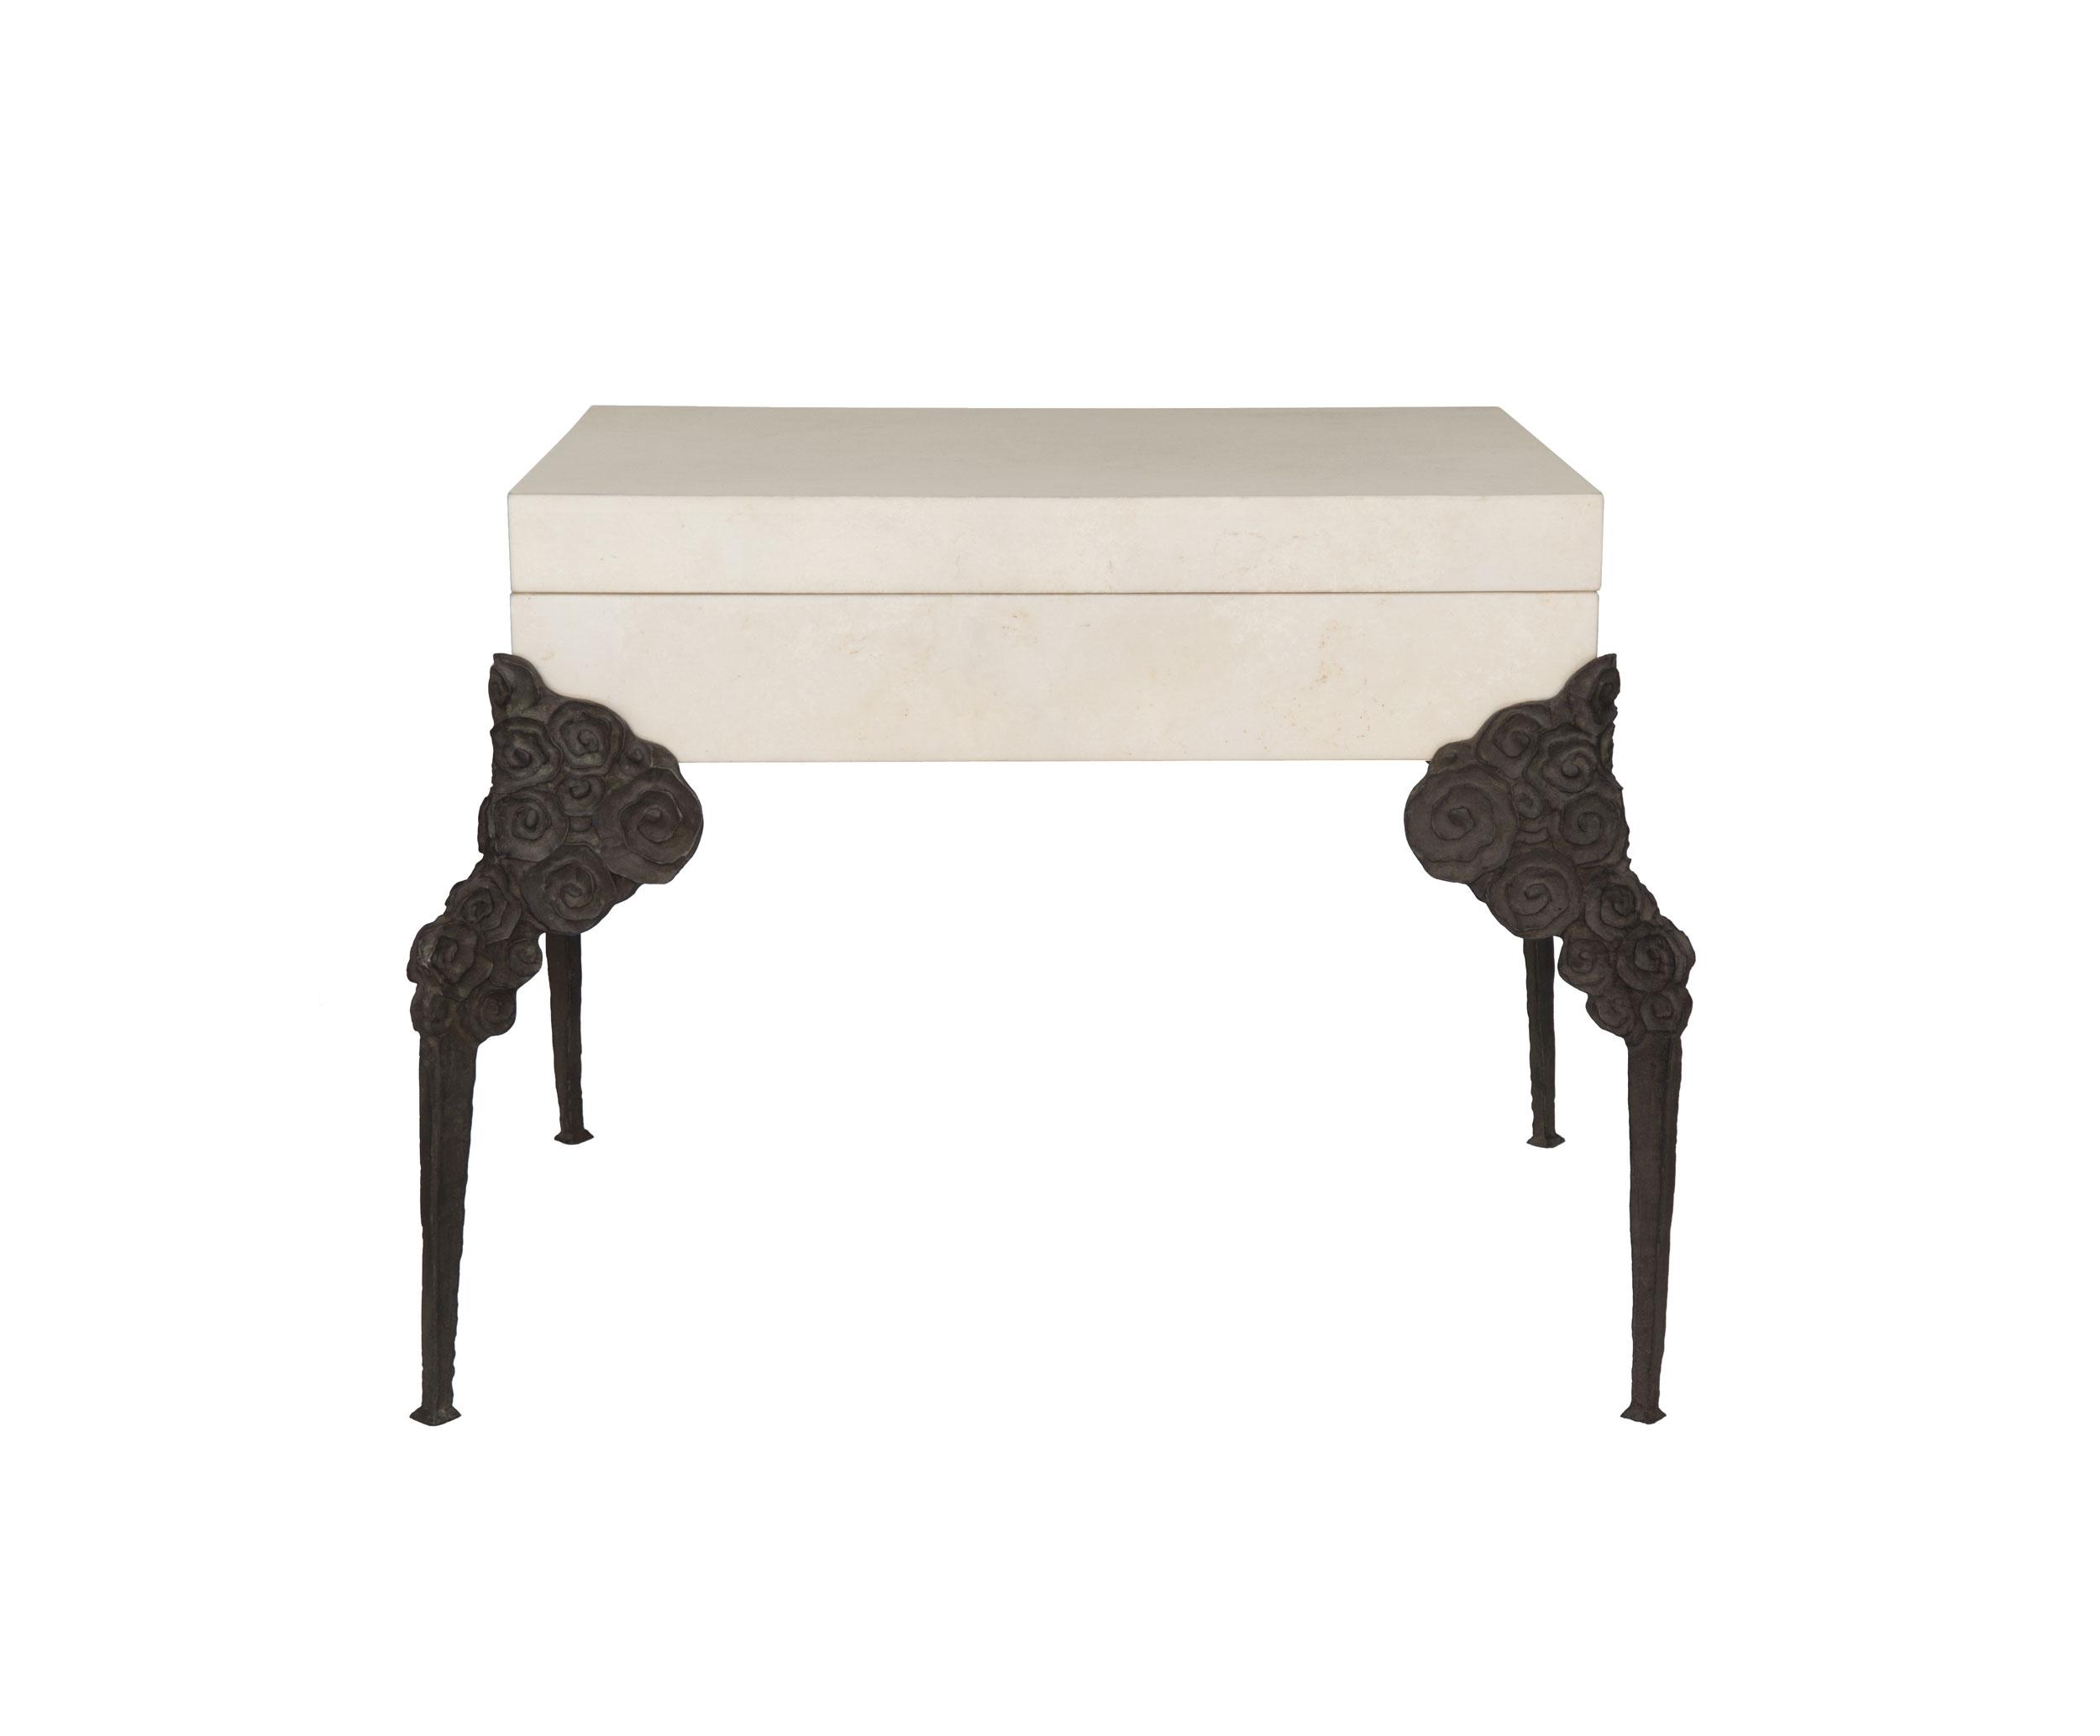 CLOUD BOX TEA TABLE